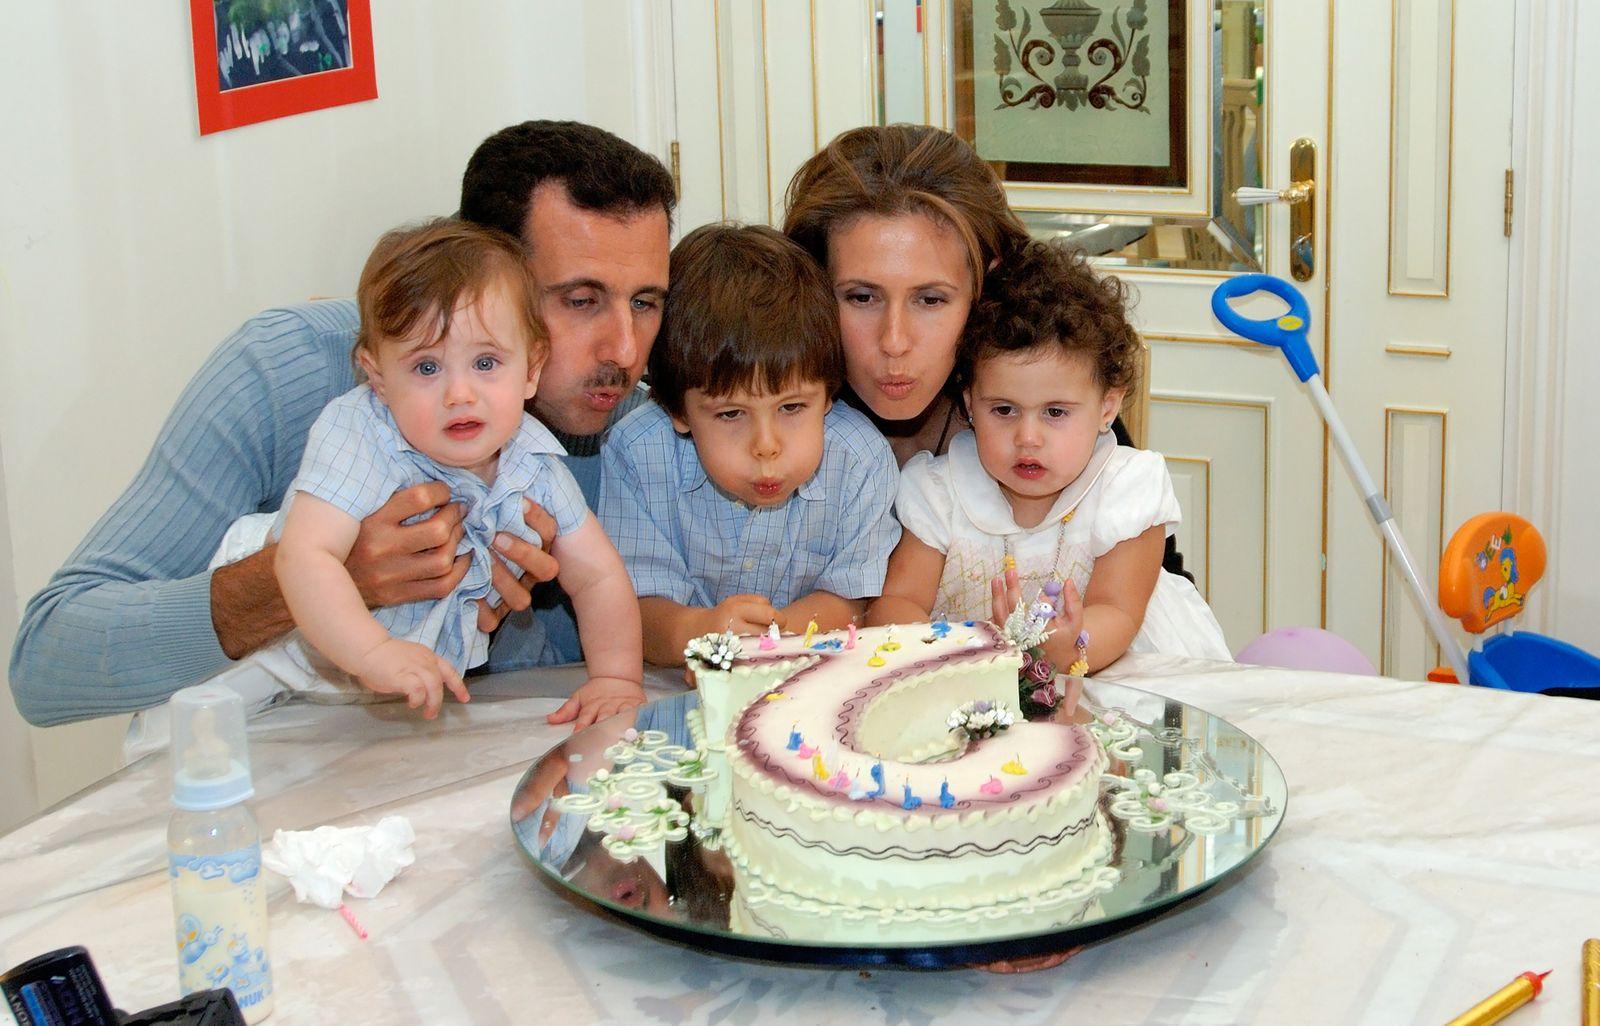 Assad Family Album